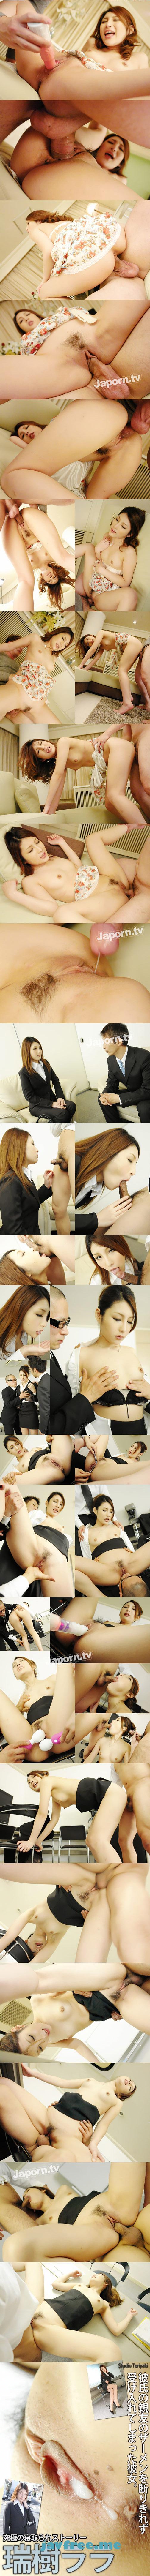 [PT 99] My best friends girlfrend : Rara Mizuki 瑞樹ララ Rara Mizuki PT